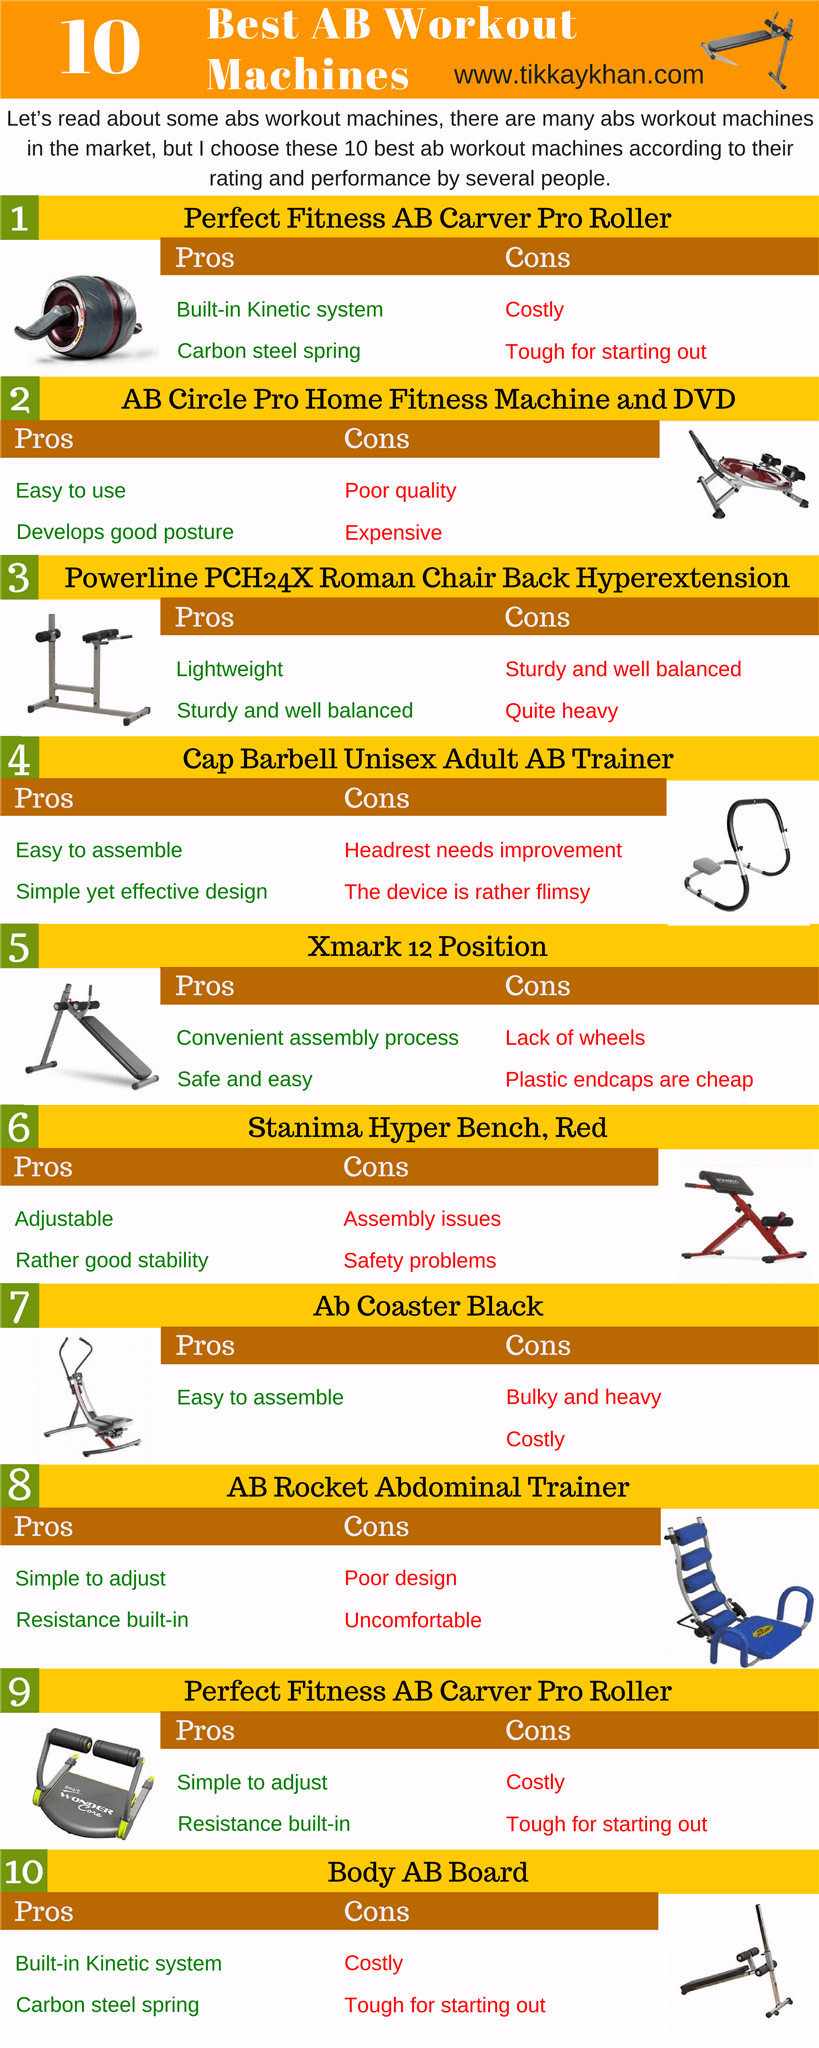 Best Abs workout machines